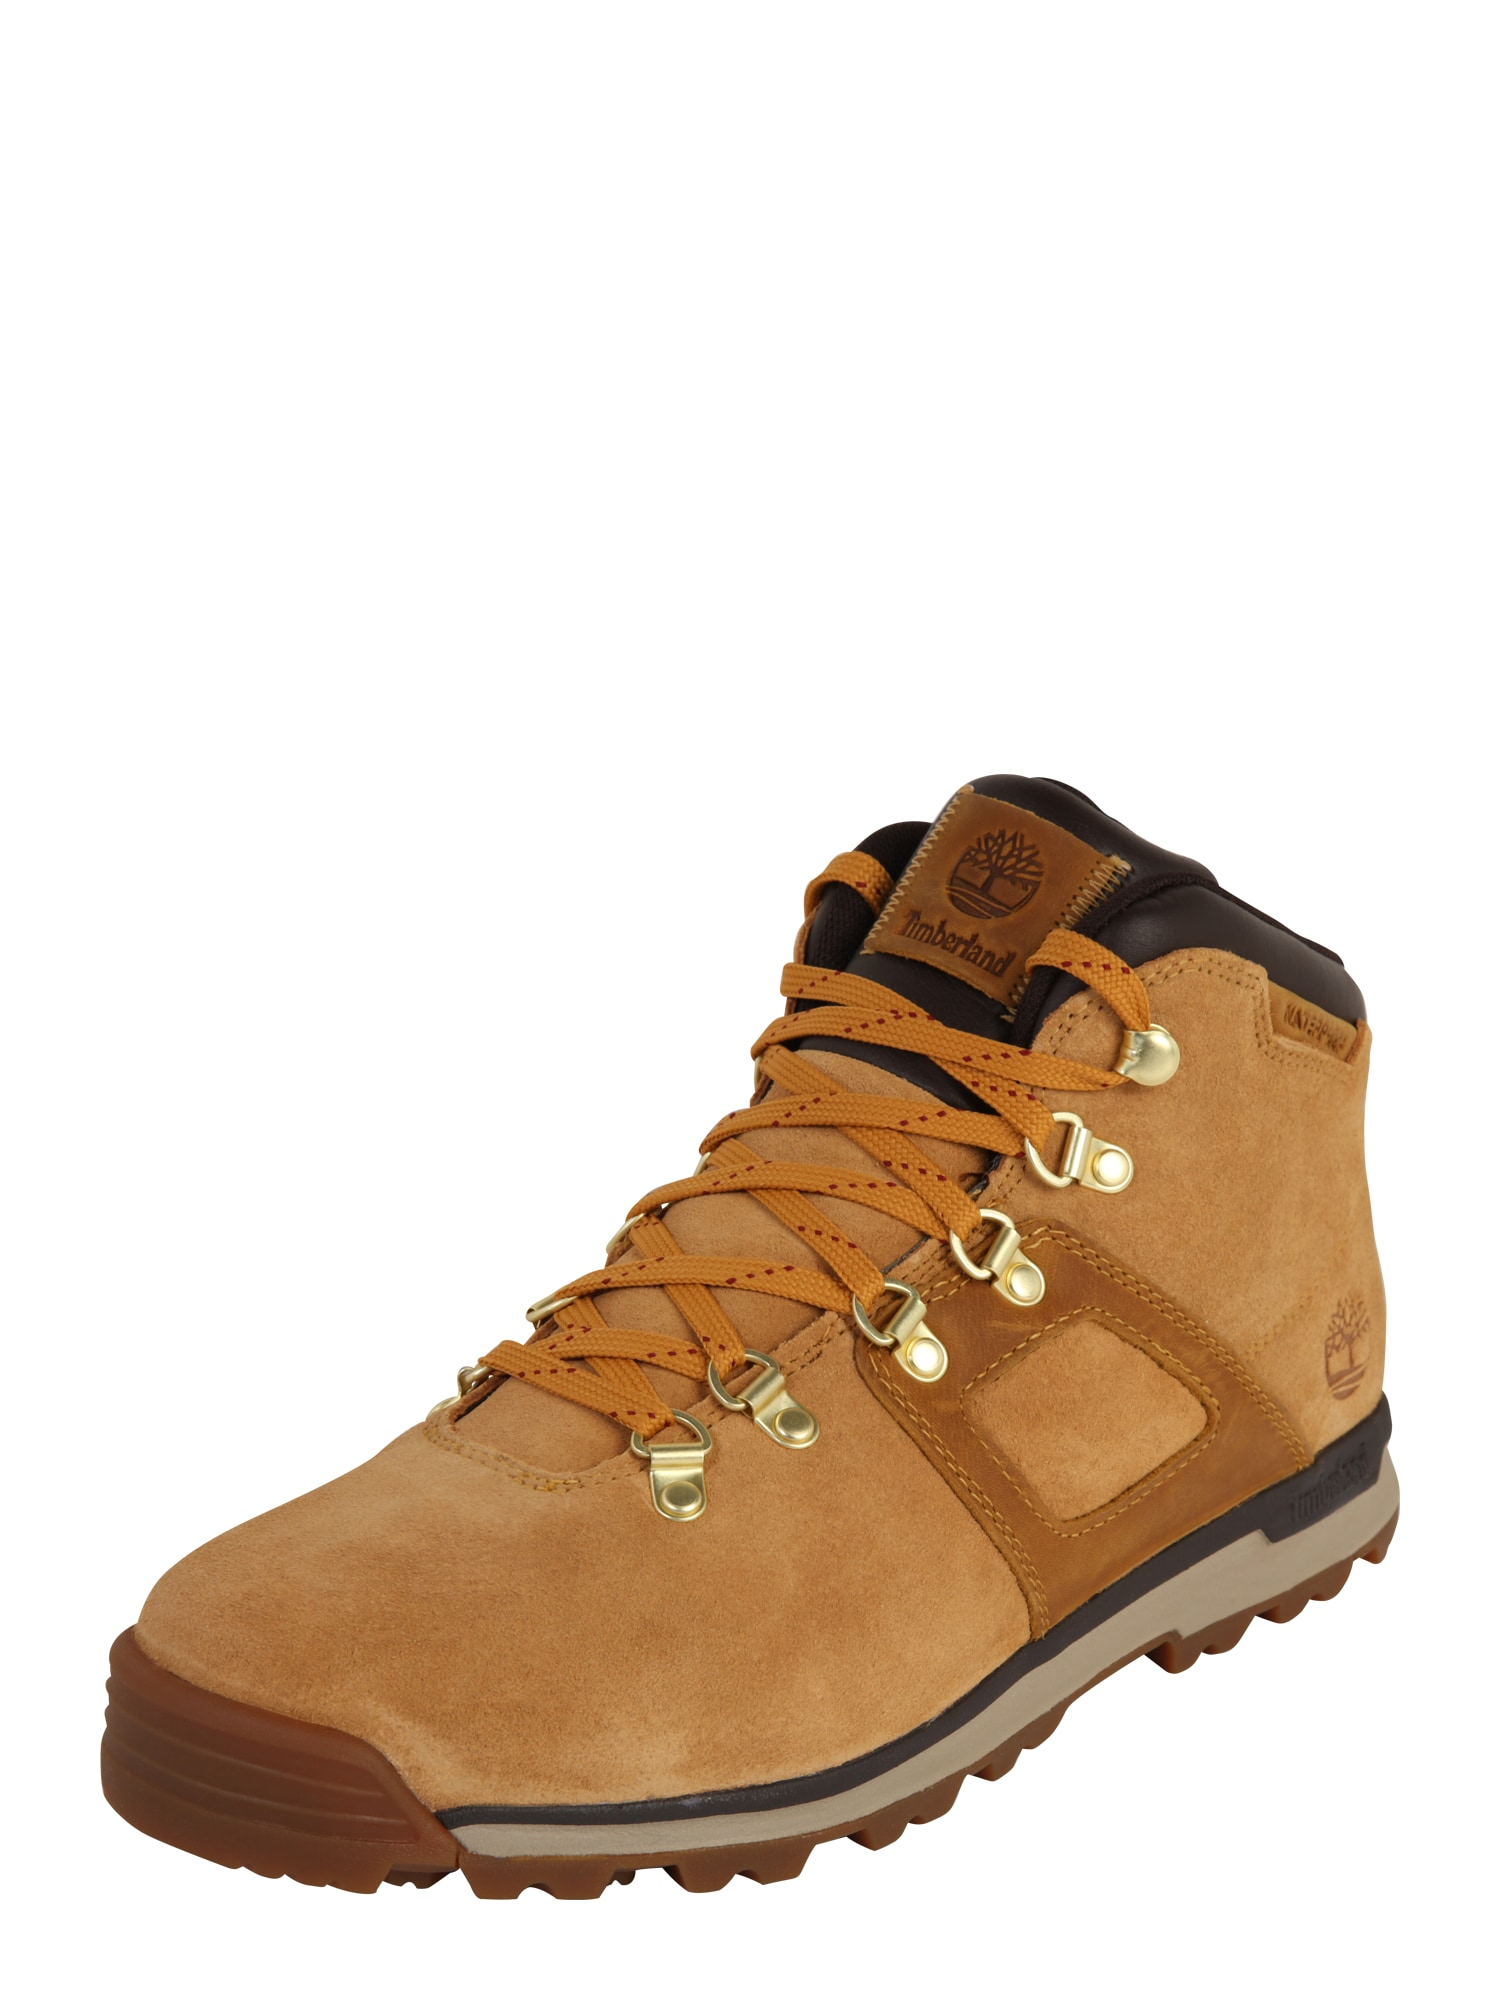 Wanderstiefel 'Scramble'   Schuhe > Outdoorschuhe > Wanderstiefel   Timberland